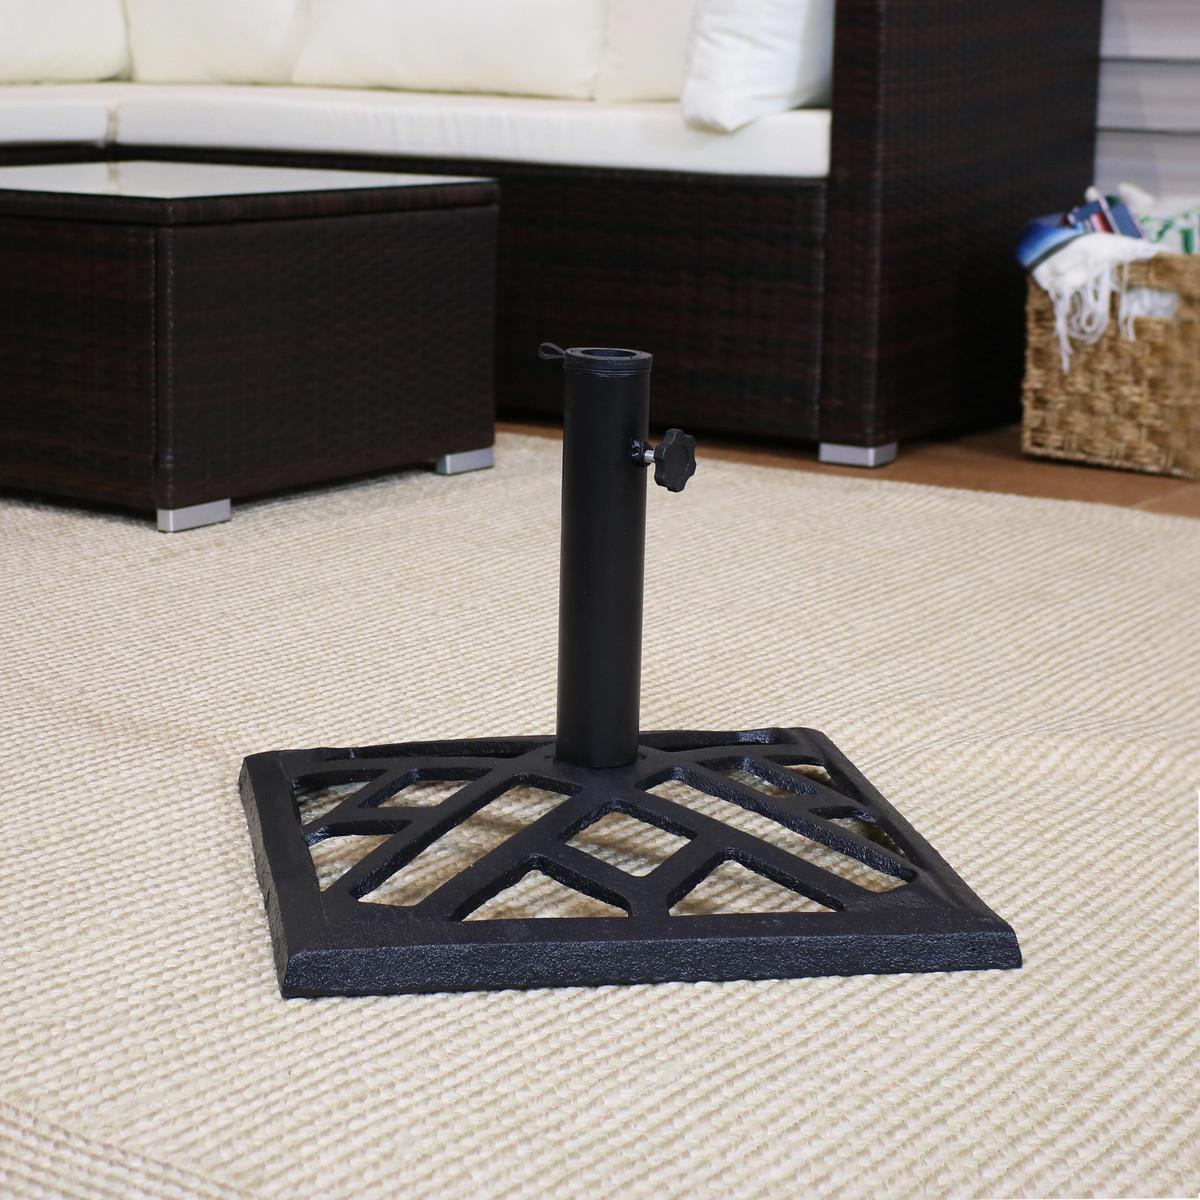 0623cdeafbc1 Sunnydaze Modern Geometric Cast Iron Patio Umbrella Base, 17-Inch Square